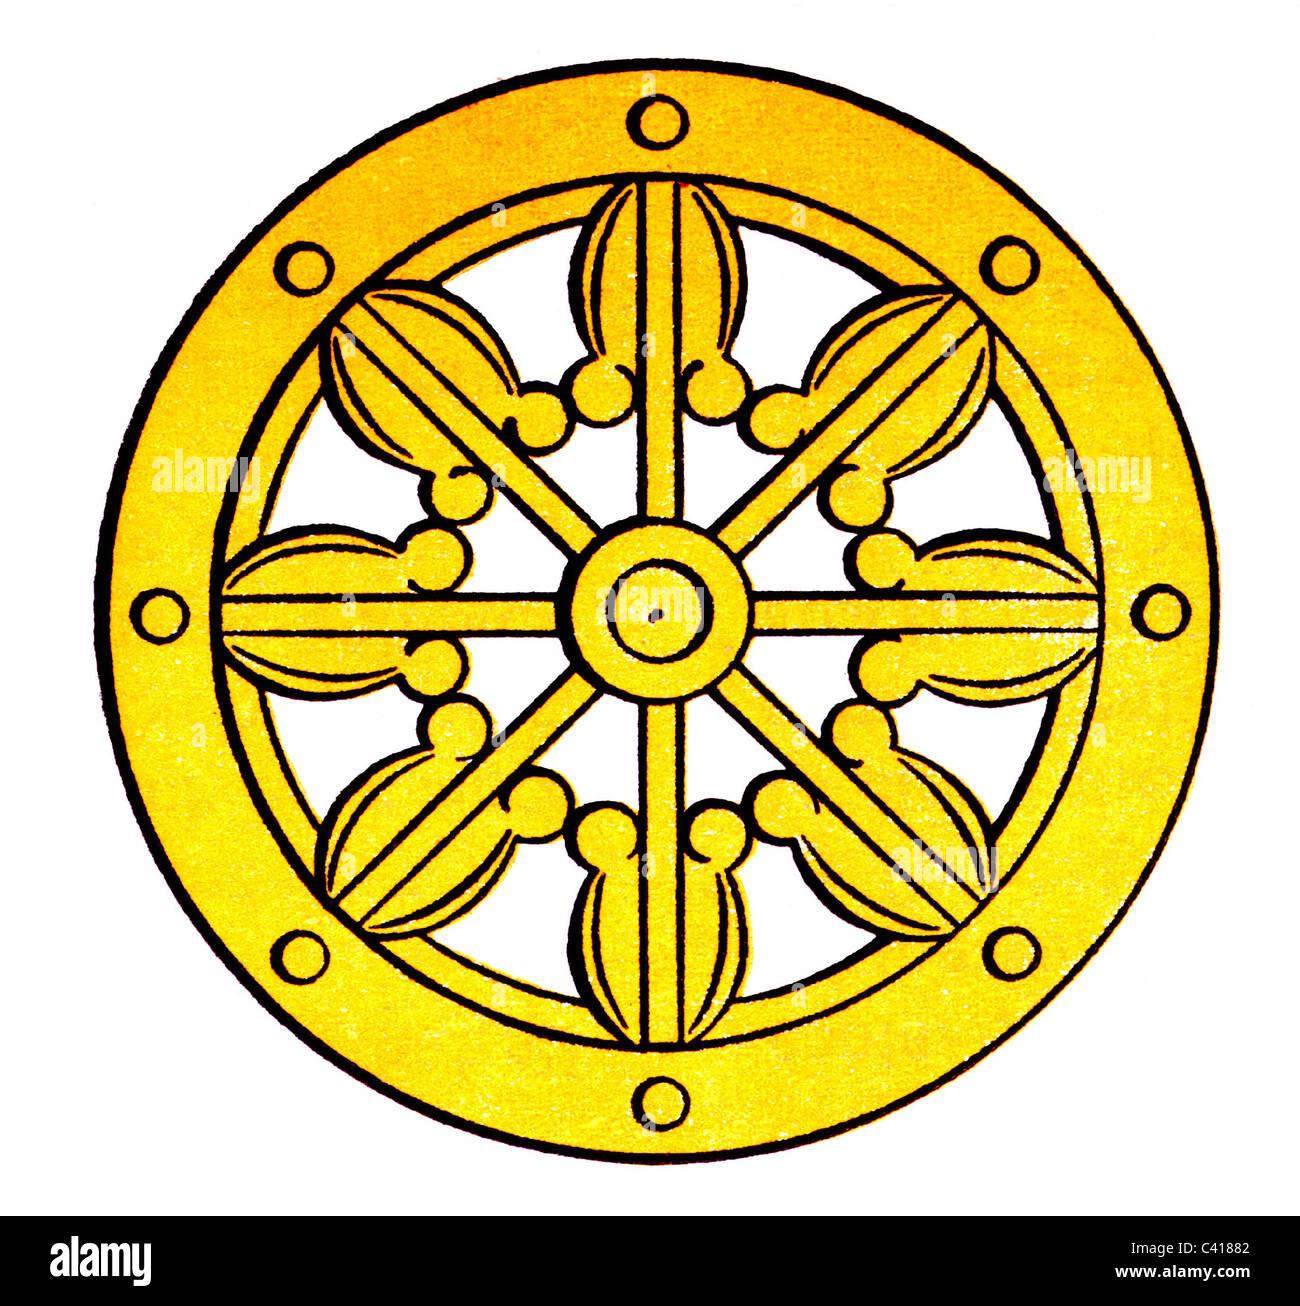 Religion buddhism wheel of law dharmacakra symbolizing the religion buddhism wheel of law dharmacakra symbolizing the path to enlightenment dharma chakra wheel of doctrine symbol biocorpaavc